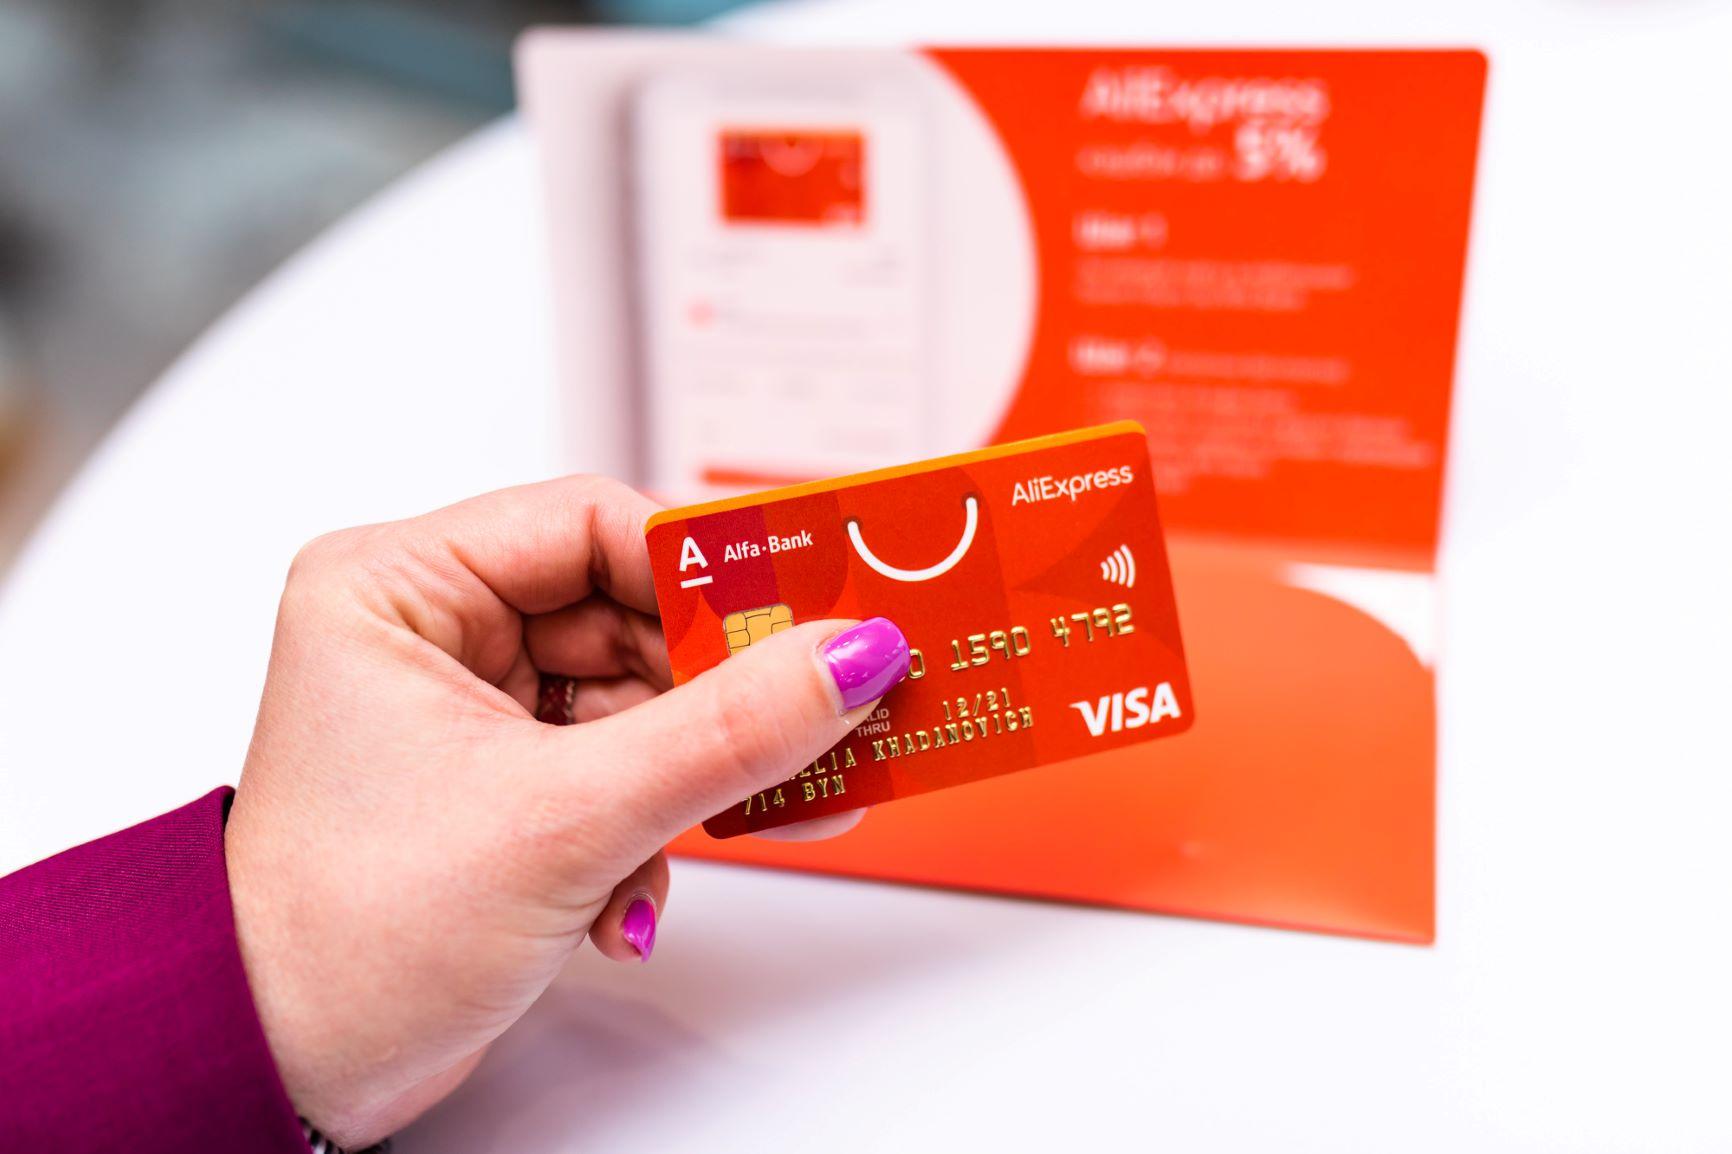 хоум банк кредит карта доставка